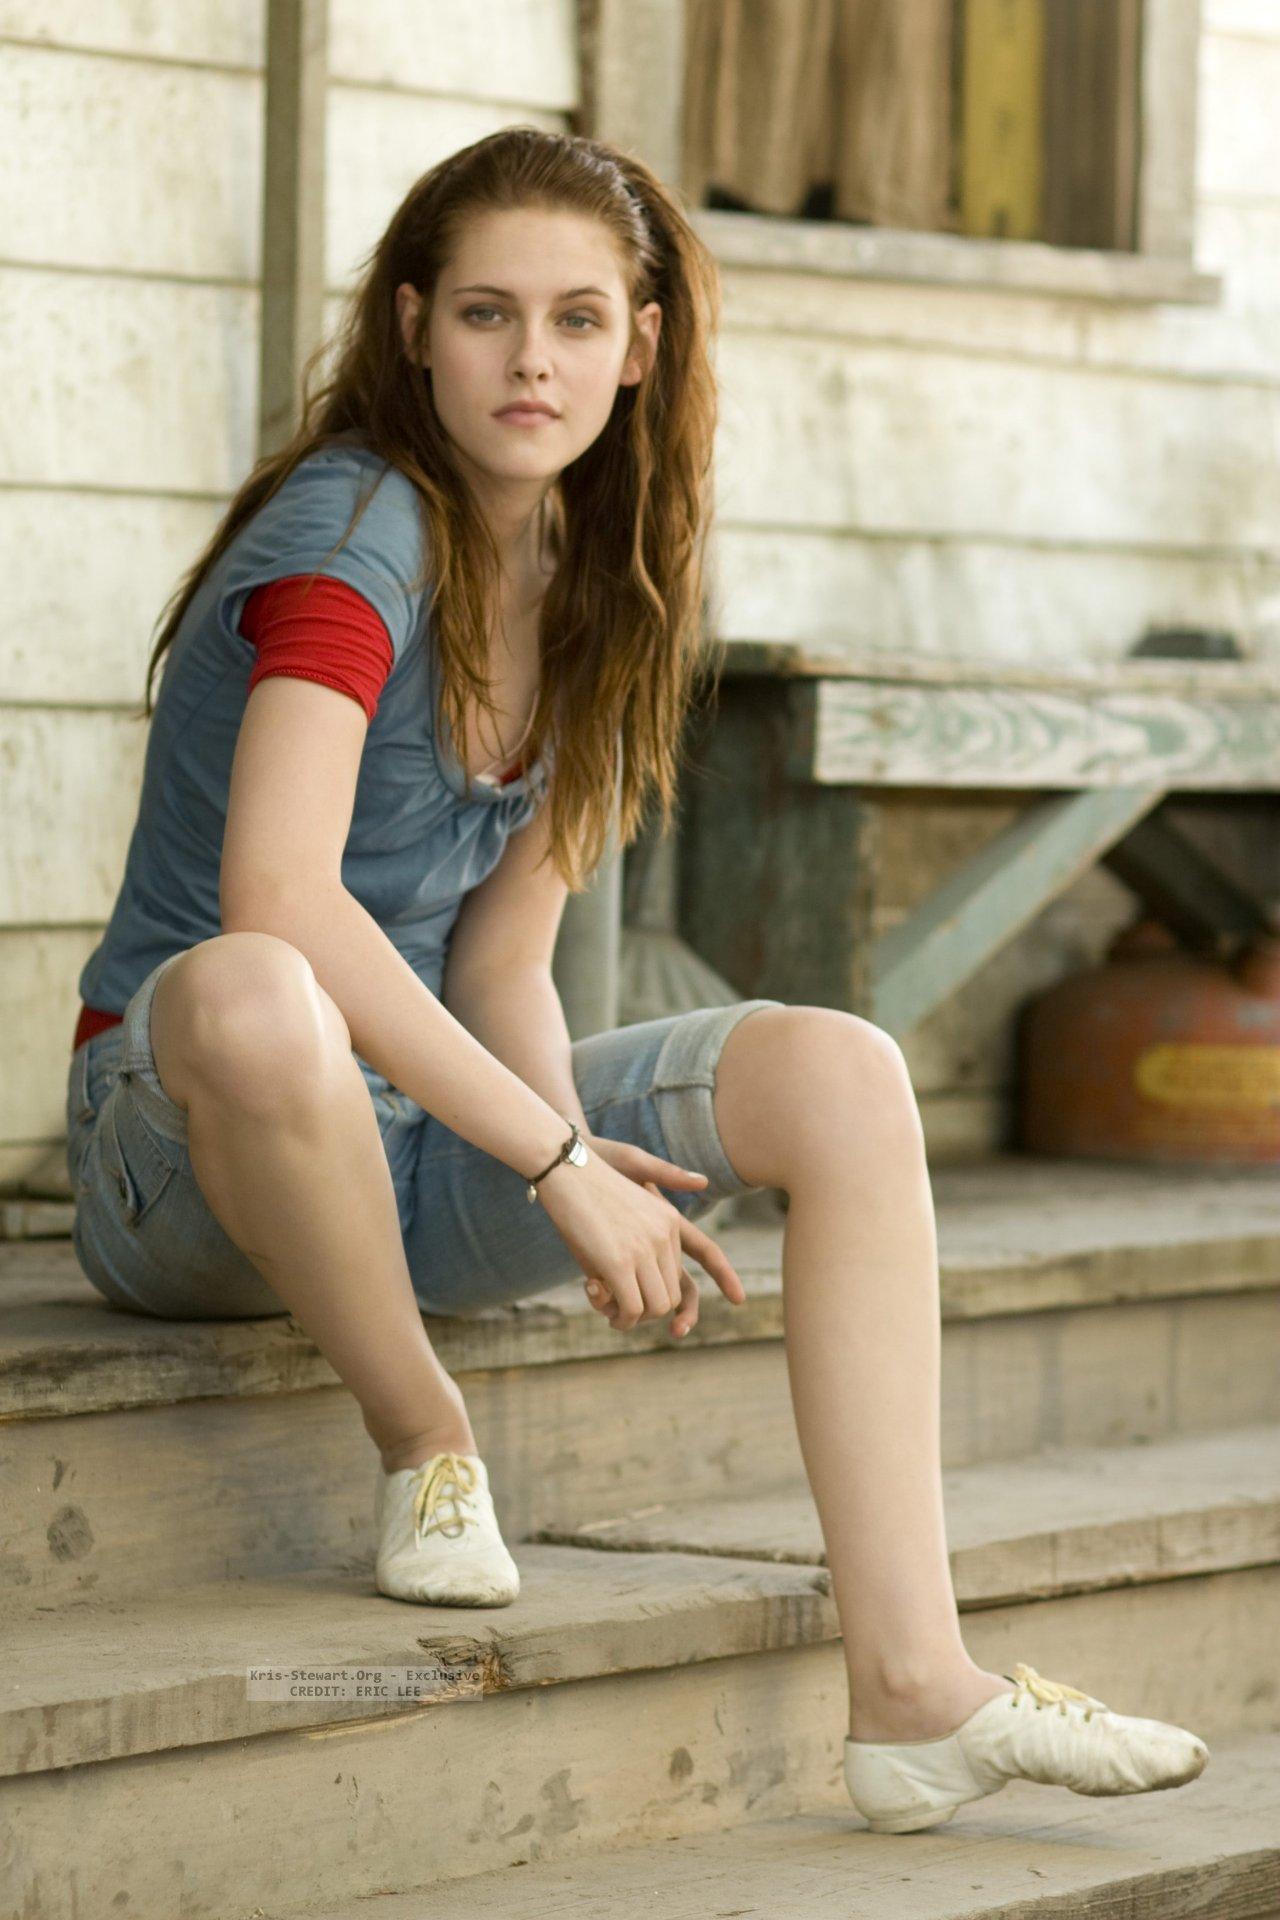 20 Outstanding Pictures of Actress Kristen Stewart